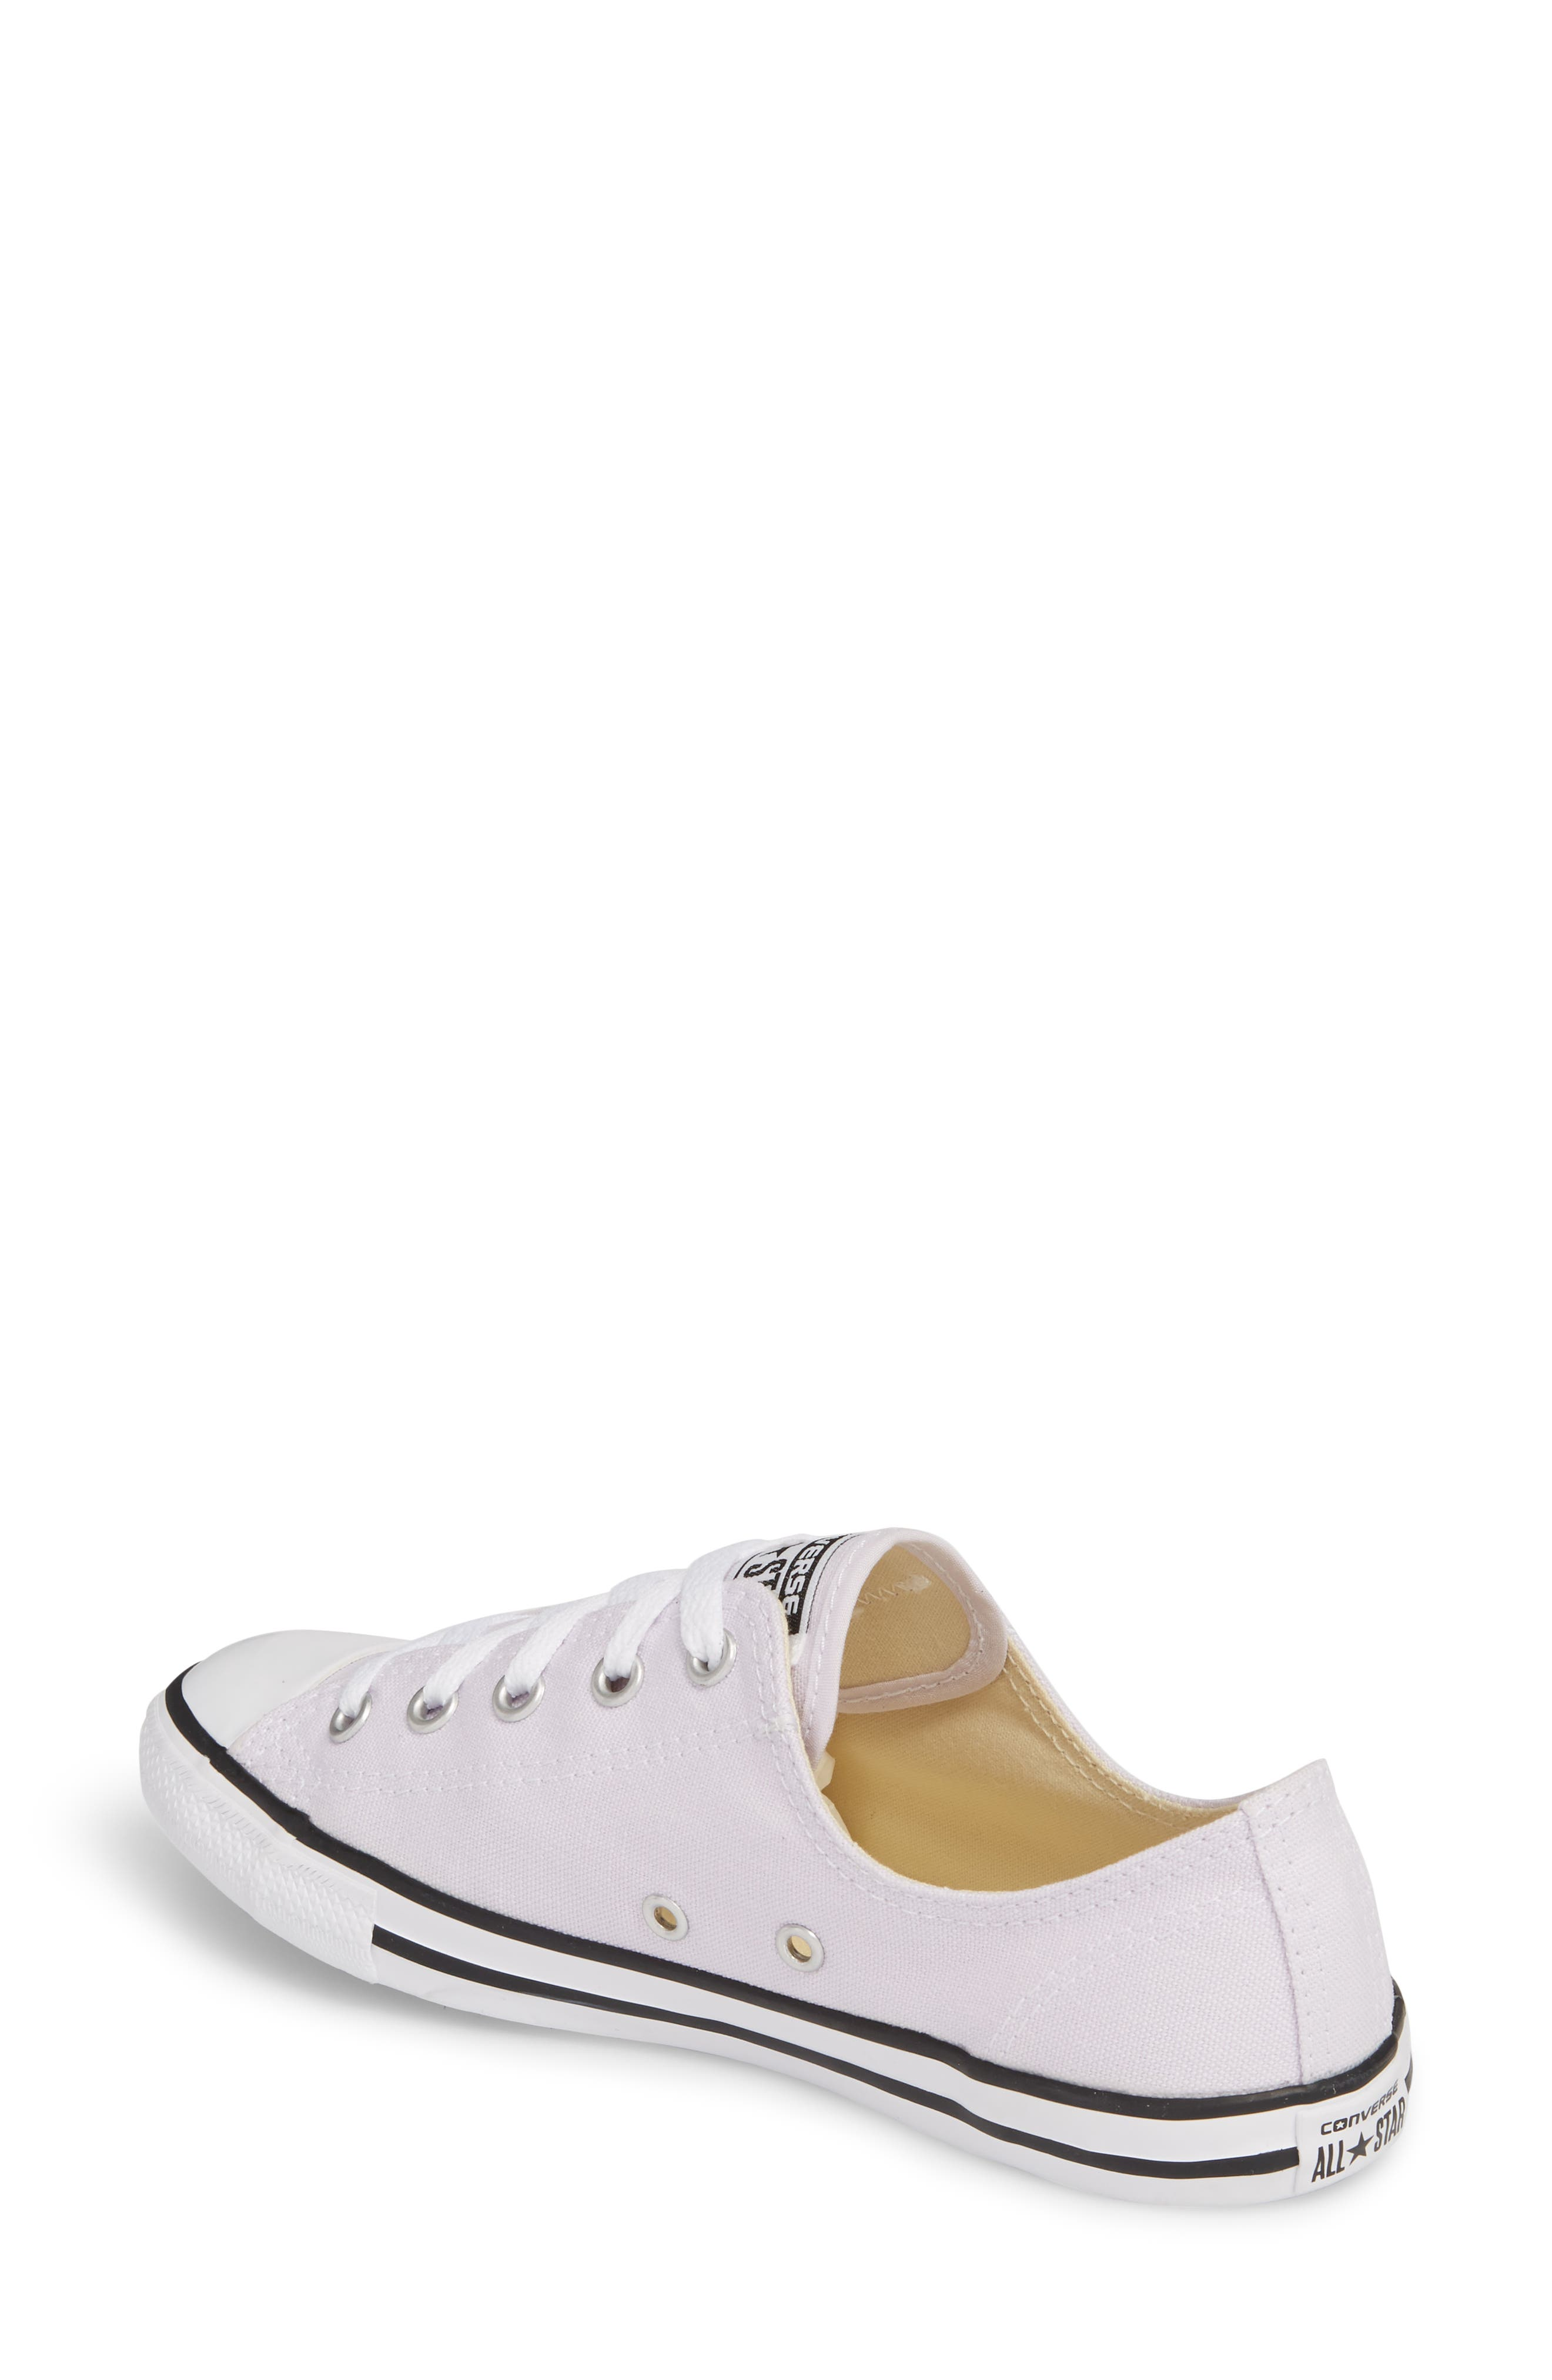 Alternate Image 2  - Converse Chuck Taylor® All Star® Dainty Ox Low Top Sneaker (Women)